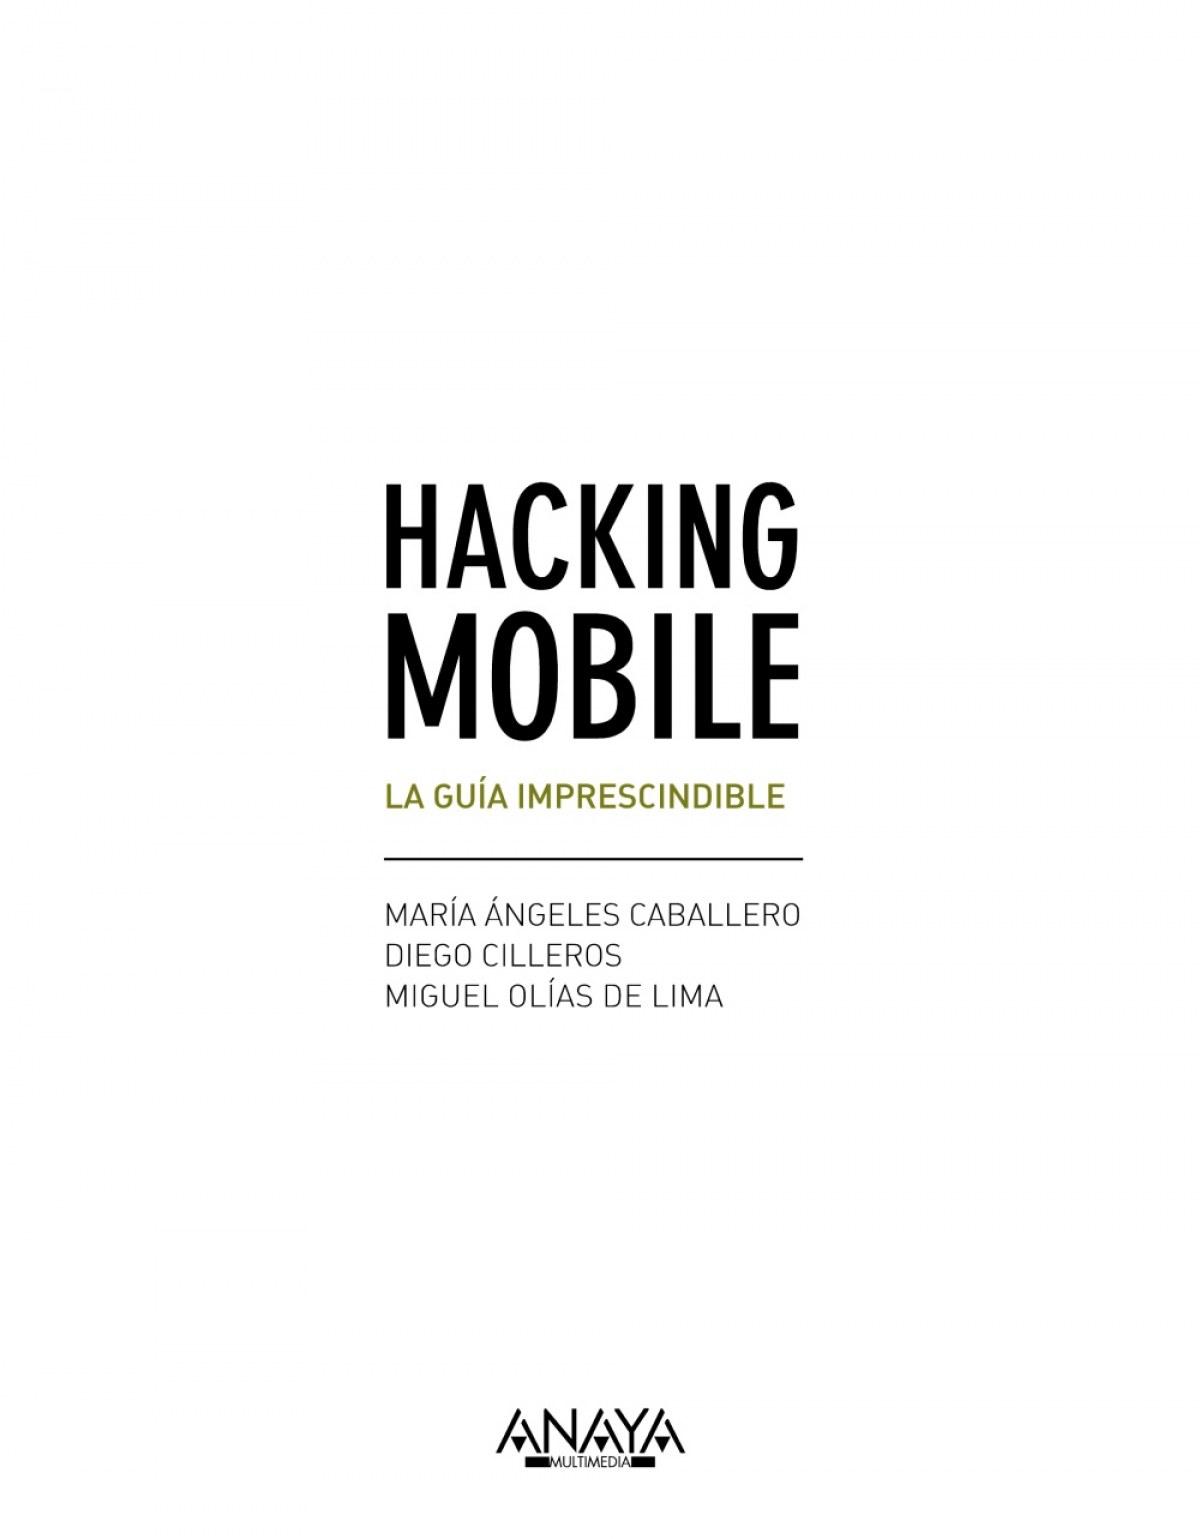 HACKING MOBILE 9788441538245